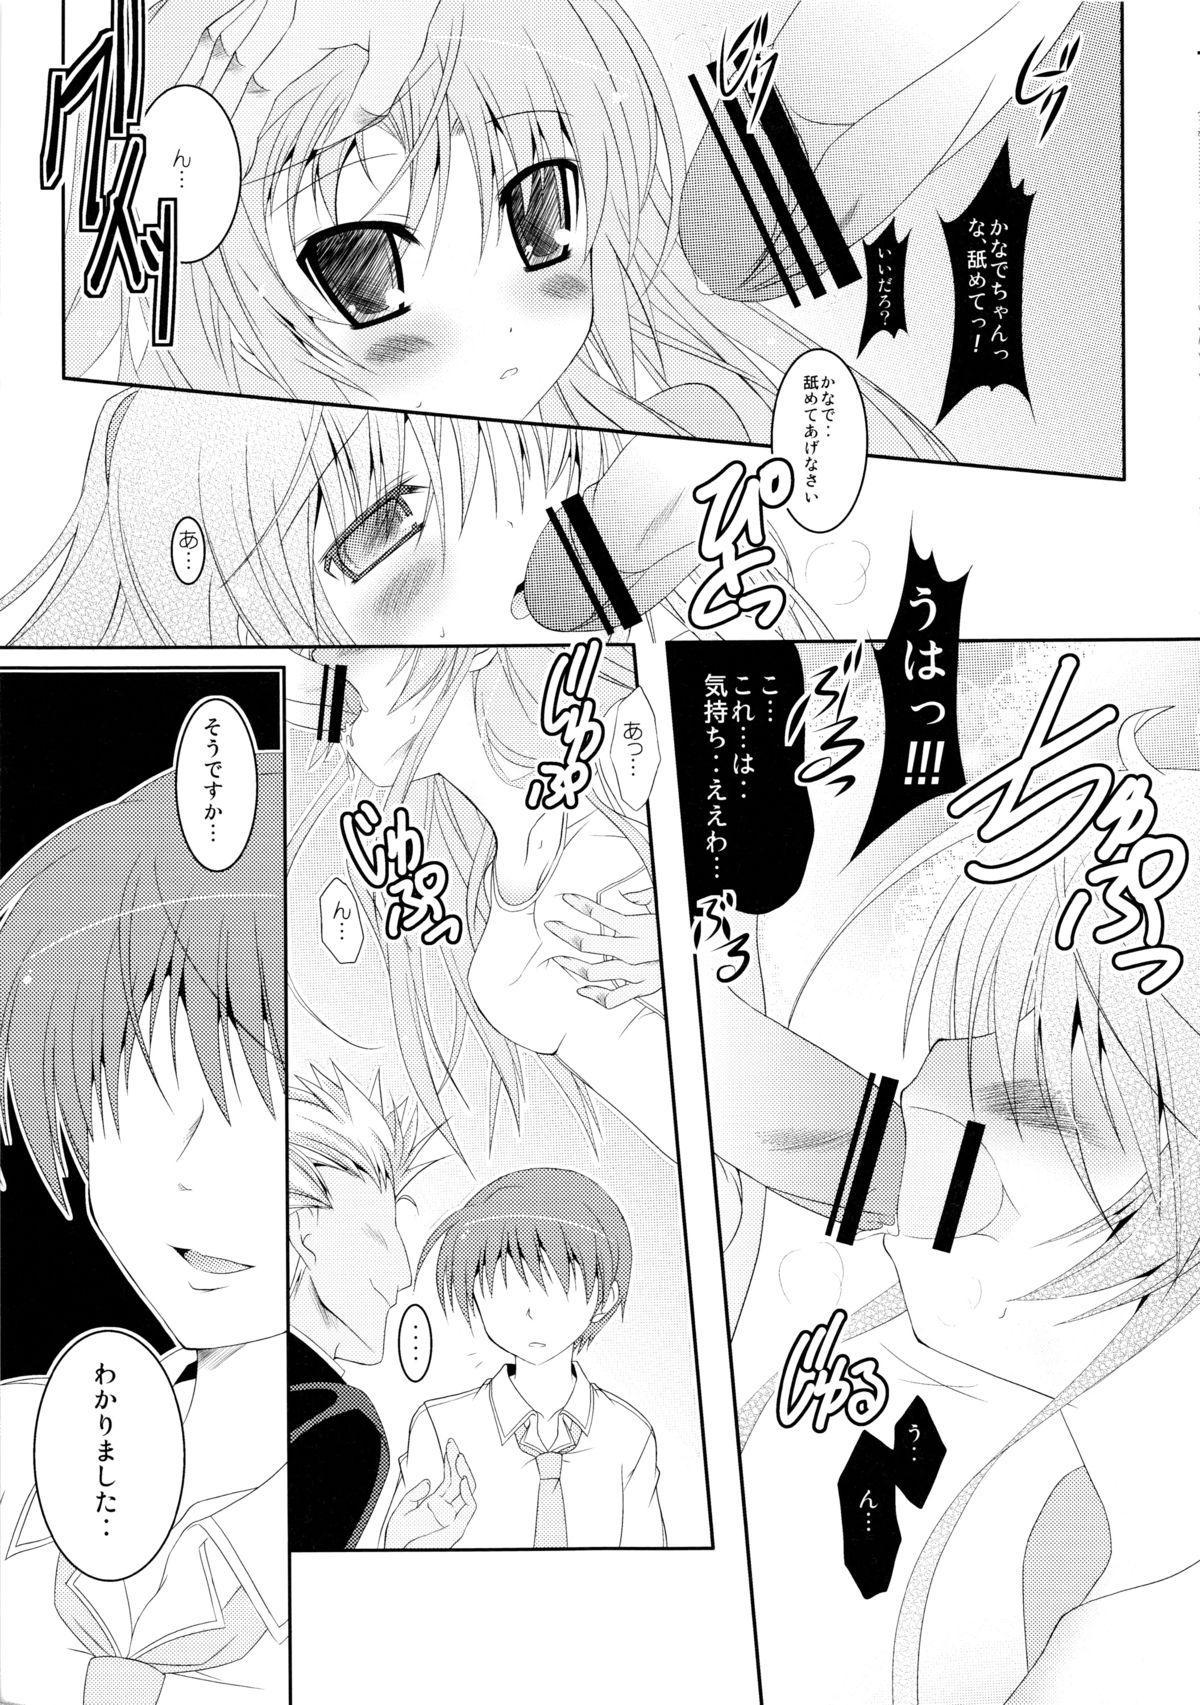 School-mer! School Mizugi Bloomer Joshi Anthology 11